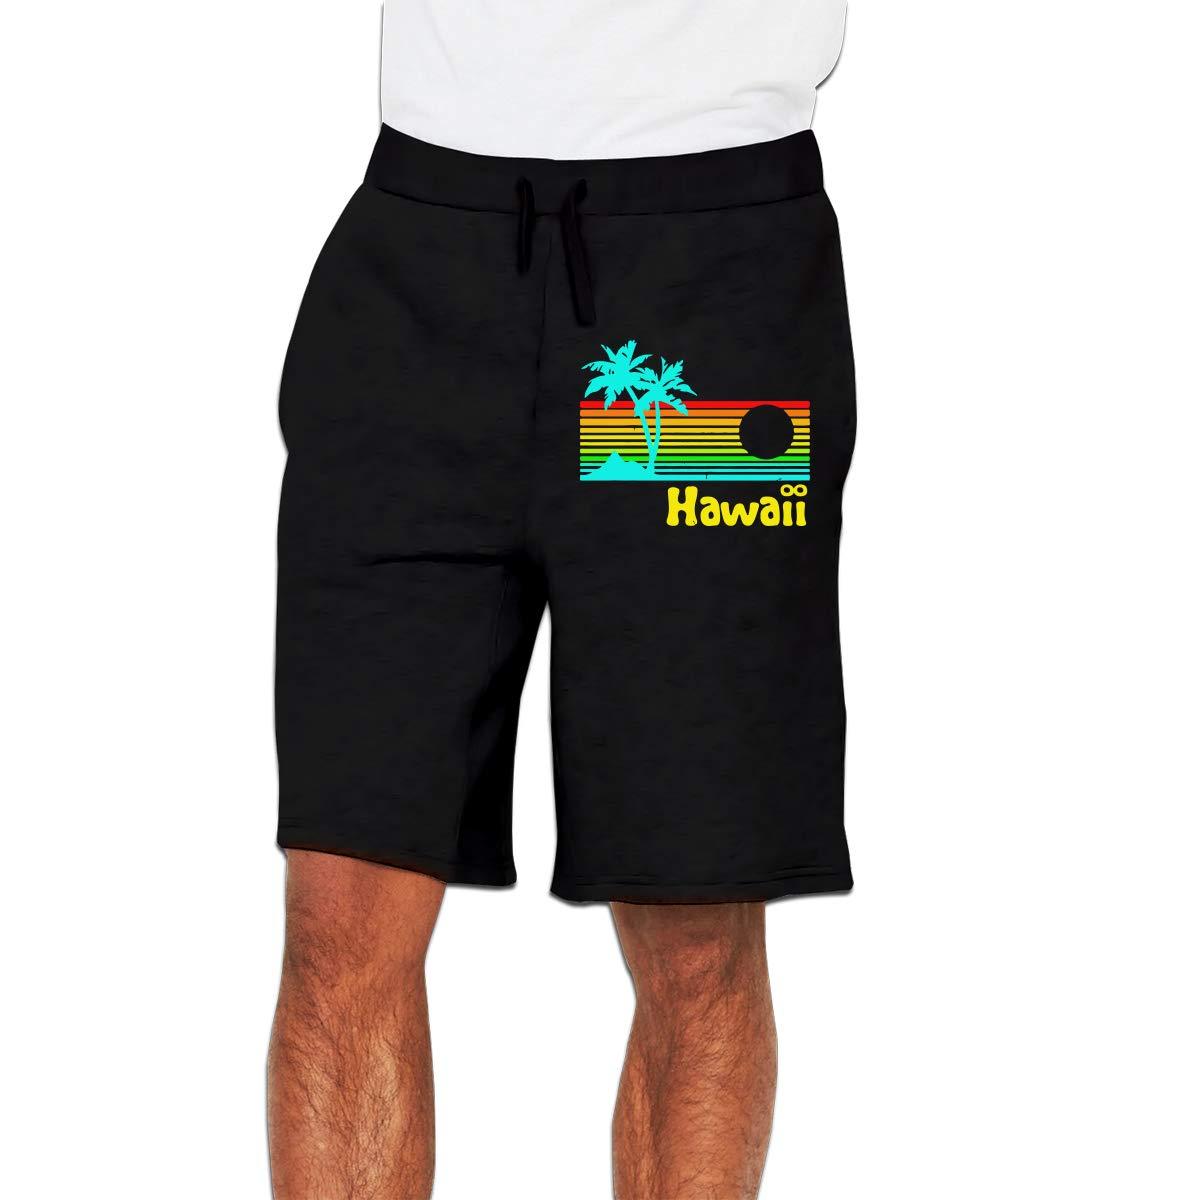 Mens Boardshorts with Elastic Waist Drawstring Trunks Retro Vintage Hawaii Patterned Gym Jogging Shorts